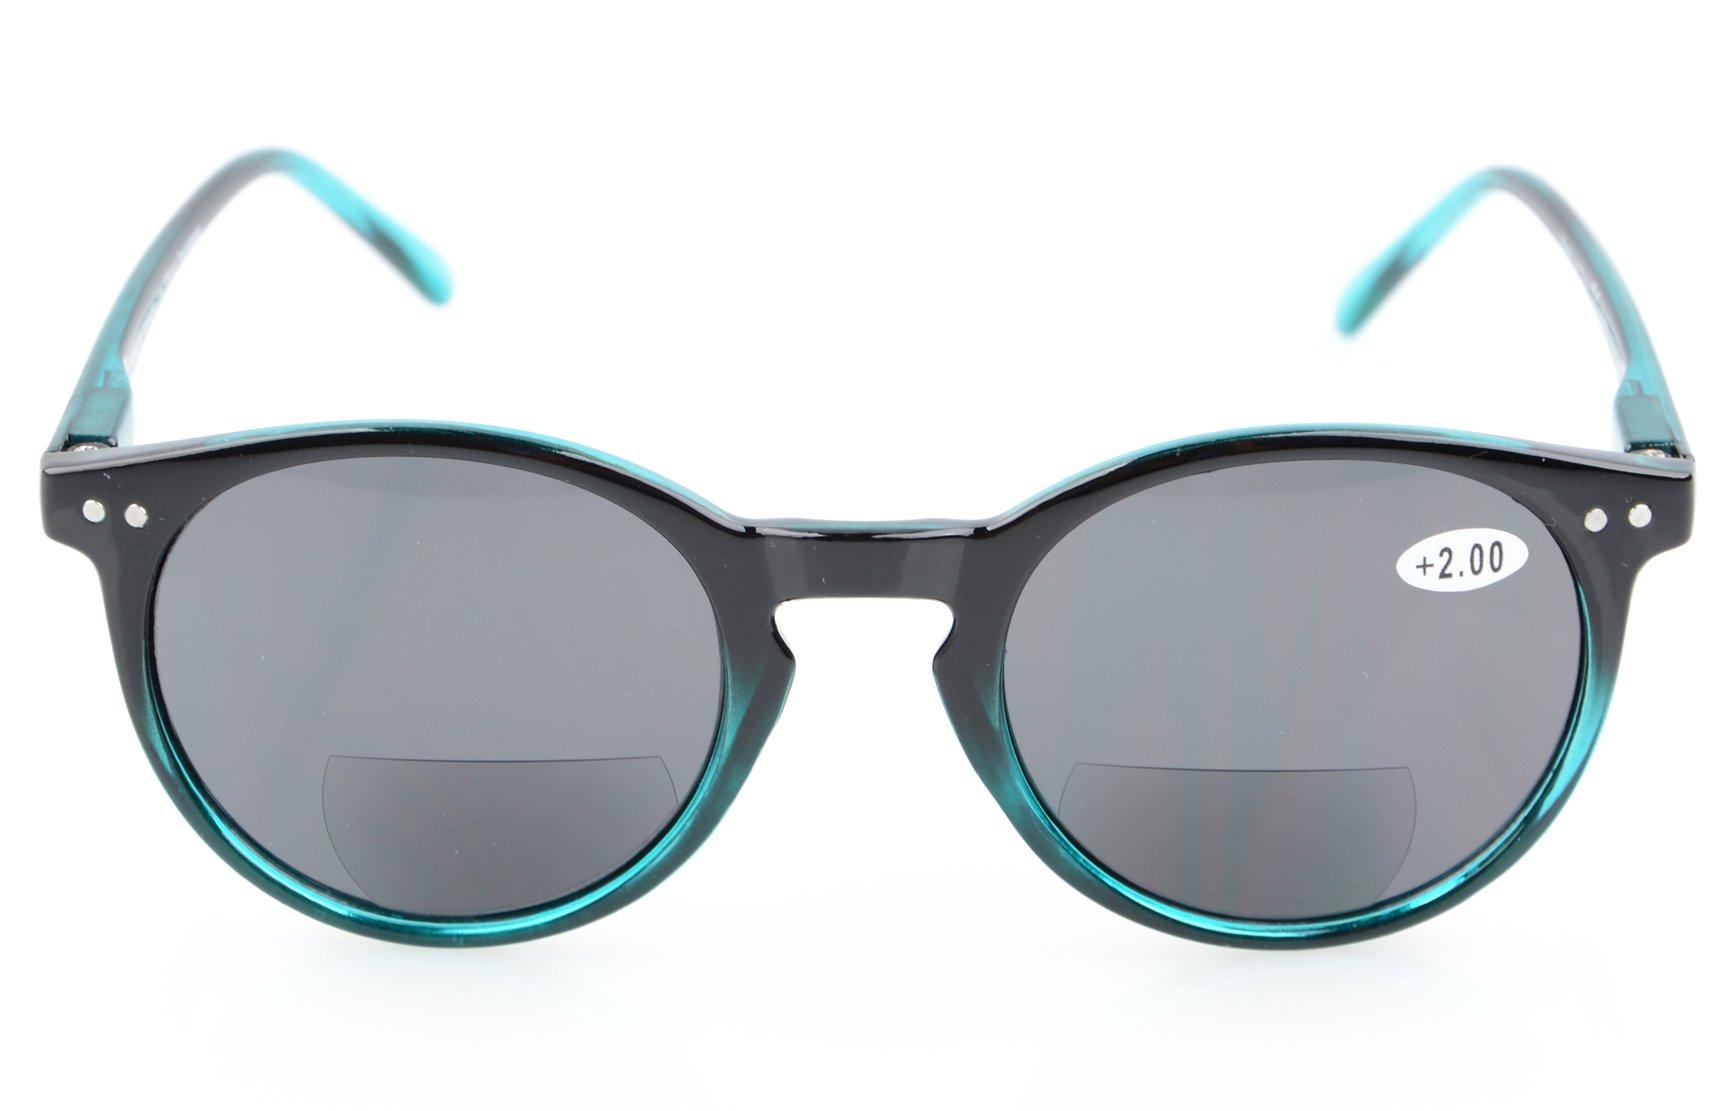 Spring-Hinged Round Bifocal Sunglasses Key Hole Style Bifocal Reading Glasses Women